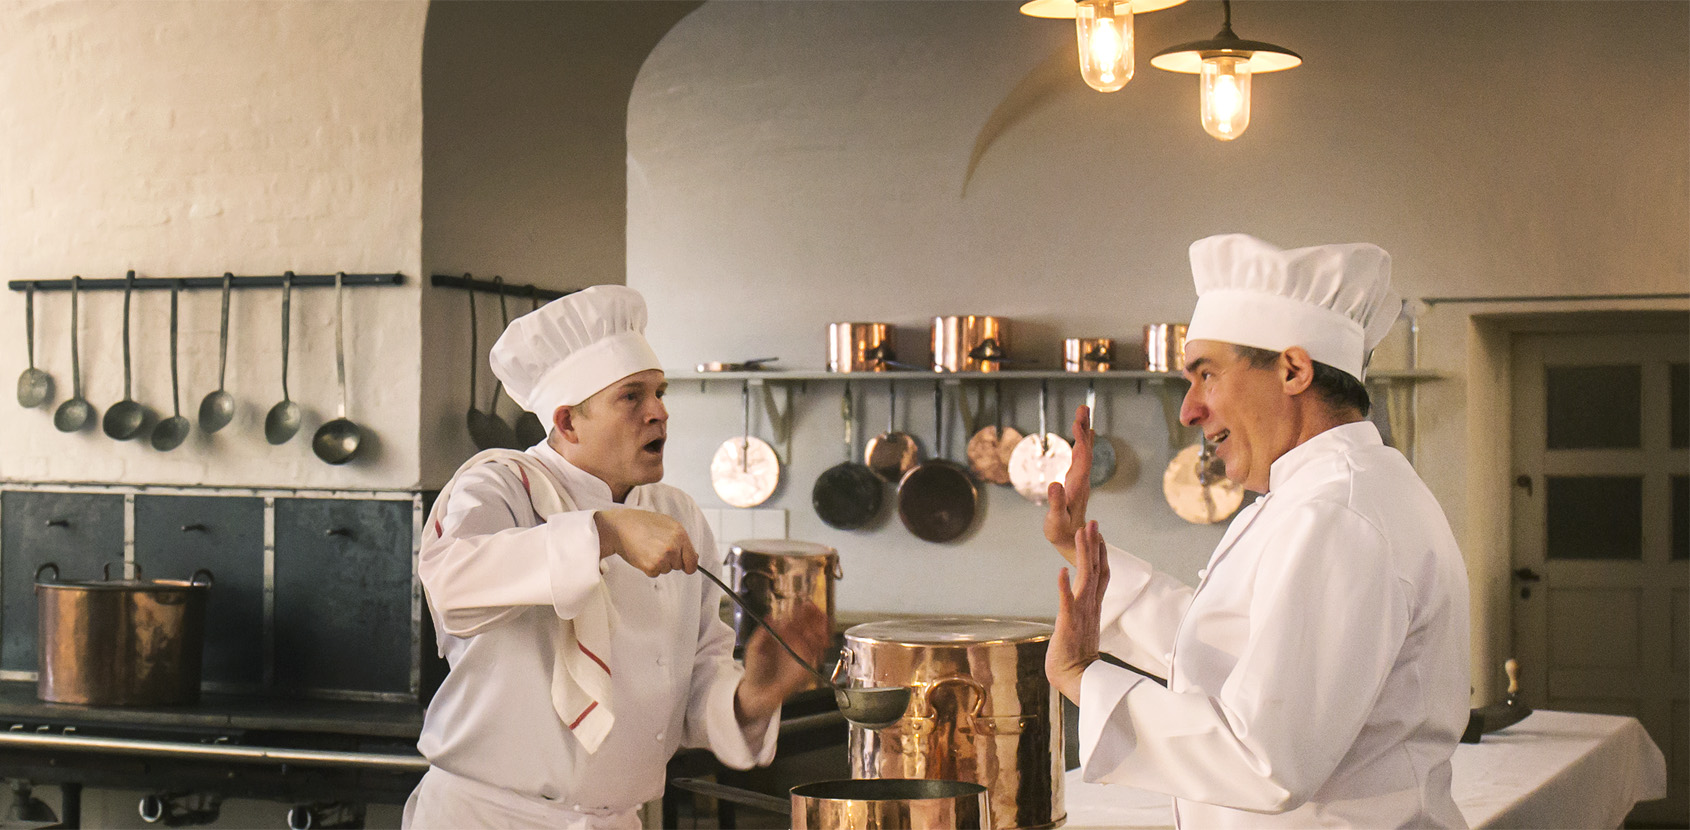 Det Kongelige Festkøkken to kokke foto Thorkild Jensen